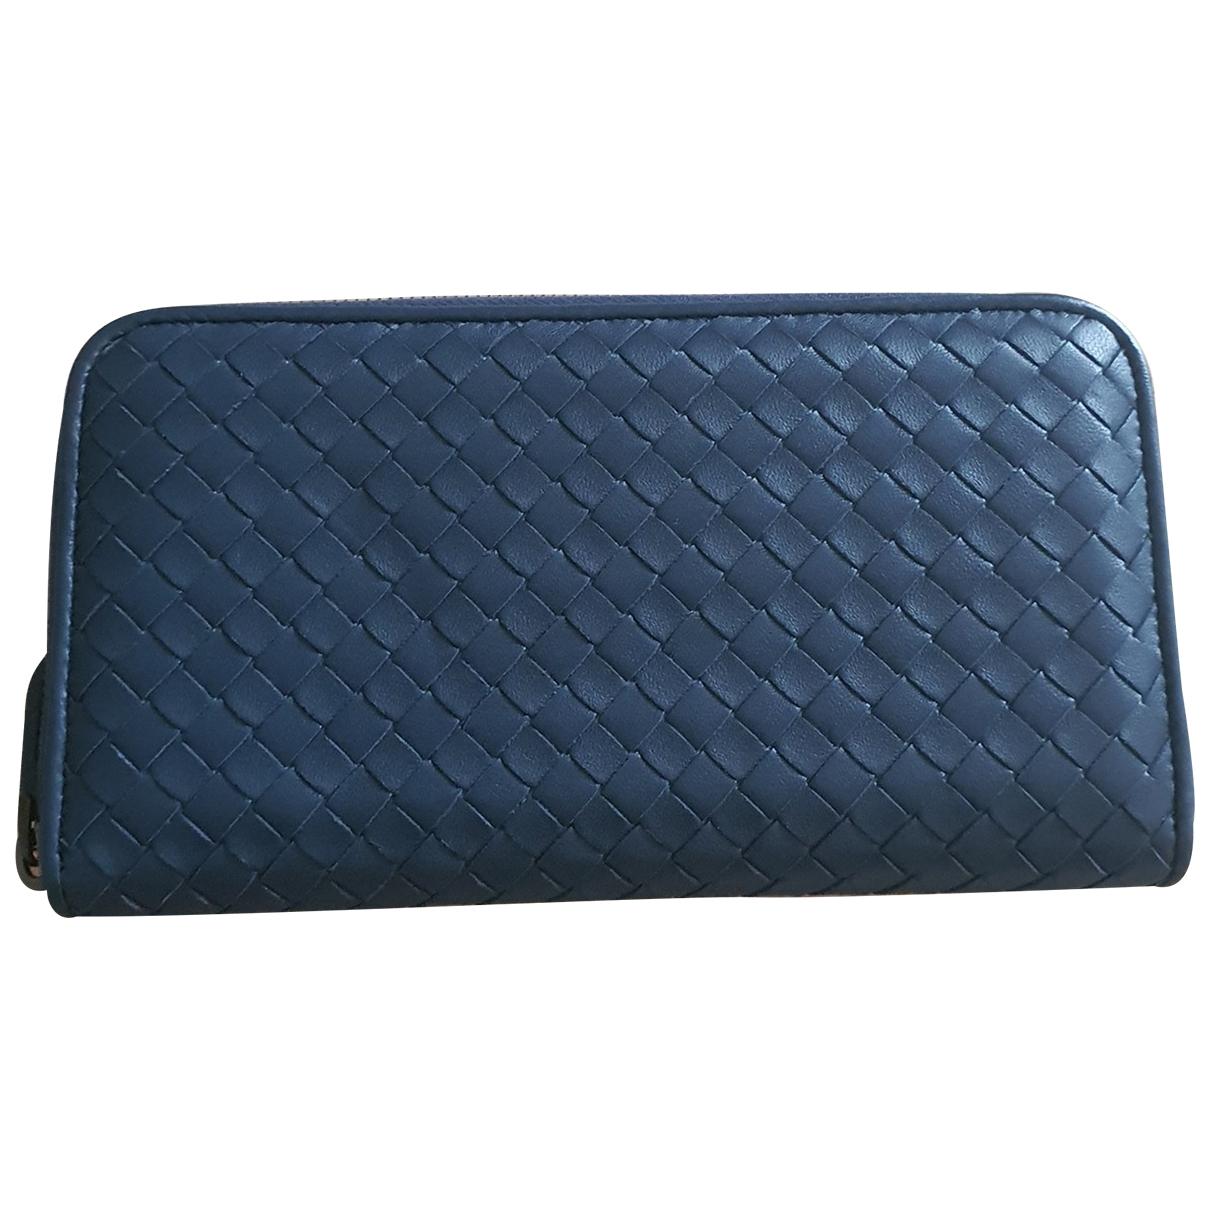 Bottega Veneta Intrecciato Blue Leather wallet for Women \N